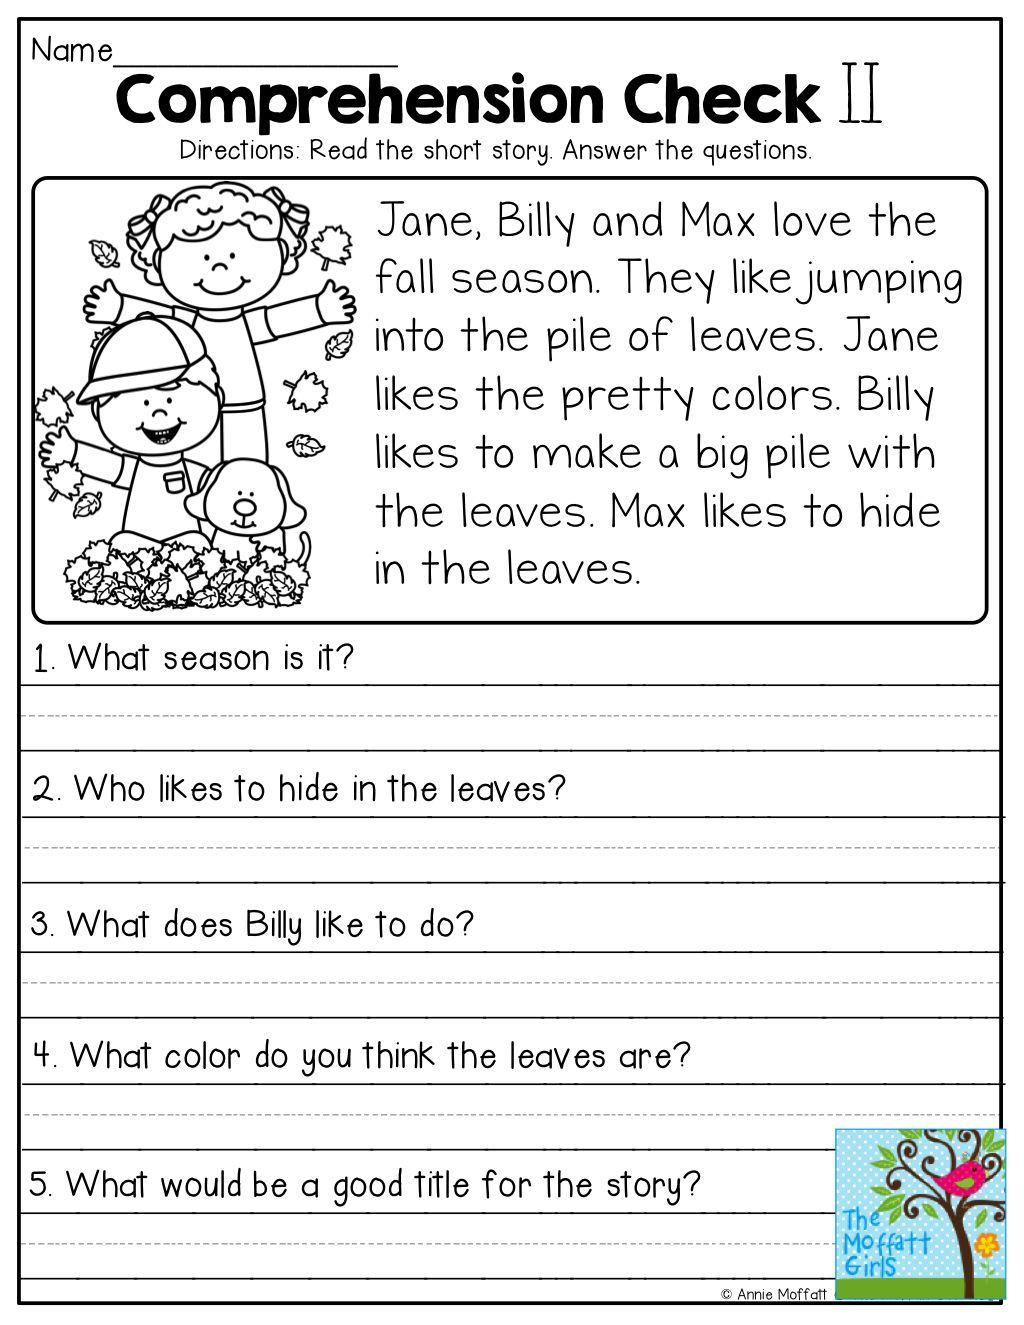 hight resolution of Image result for october reading comprehension worksheets 1st grade    Reading comprehension worksheets